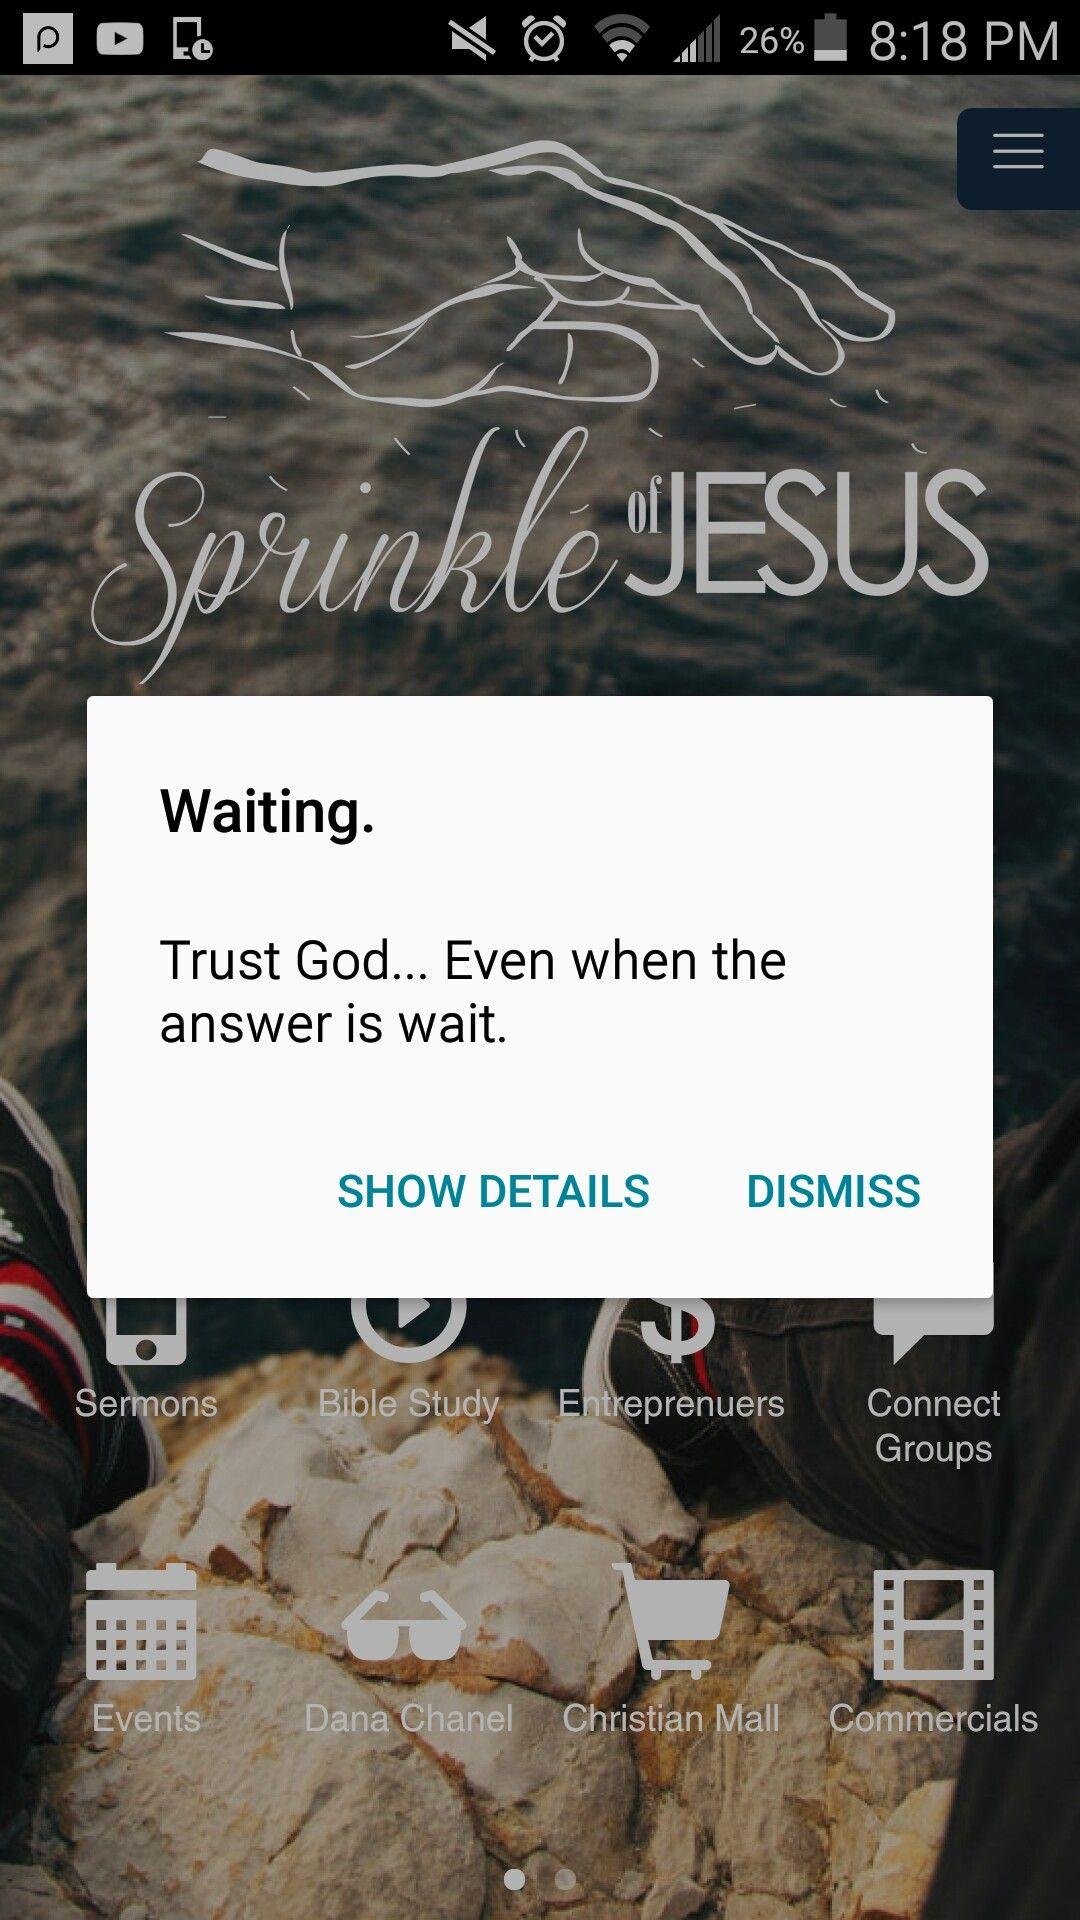 Christian Inspirational Quotes Life Pinkaylee Griffin On Sprinkle Of Jesus✨  Pinterest  Abundance